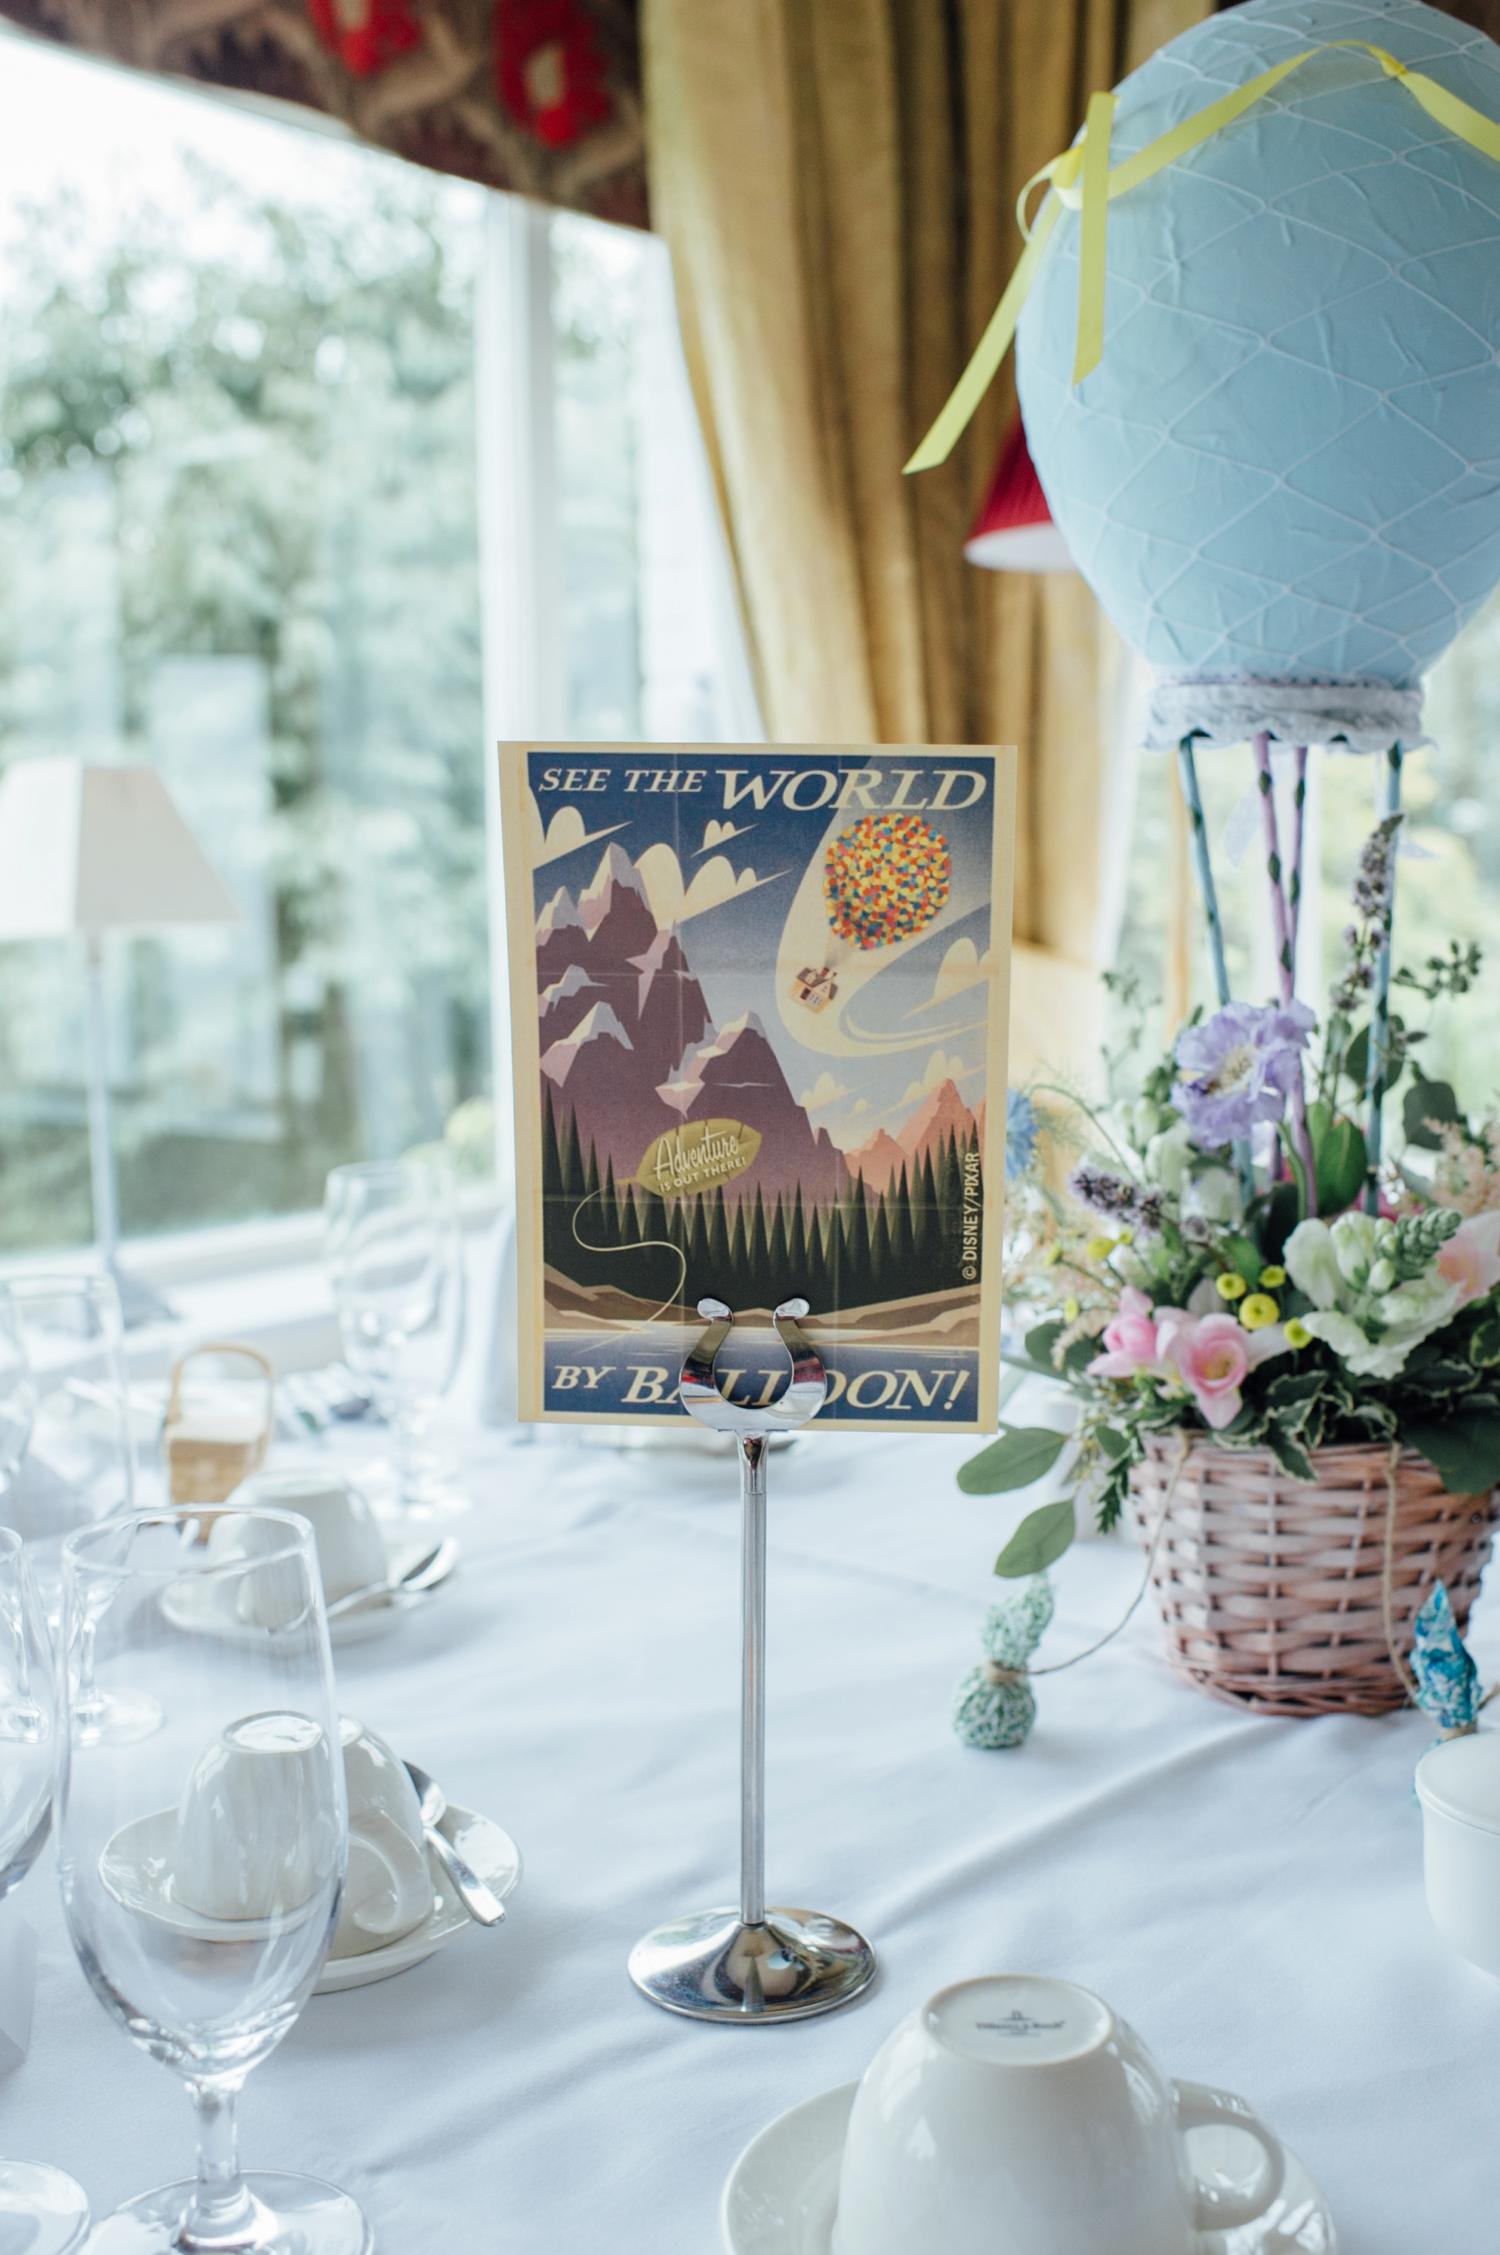 070-lisa-devine-photography-alternative-creative-wedding-photography-glasgow-scotland-uk.JPG